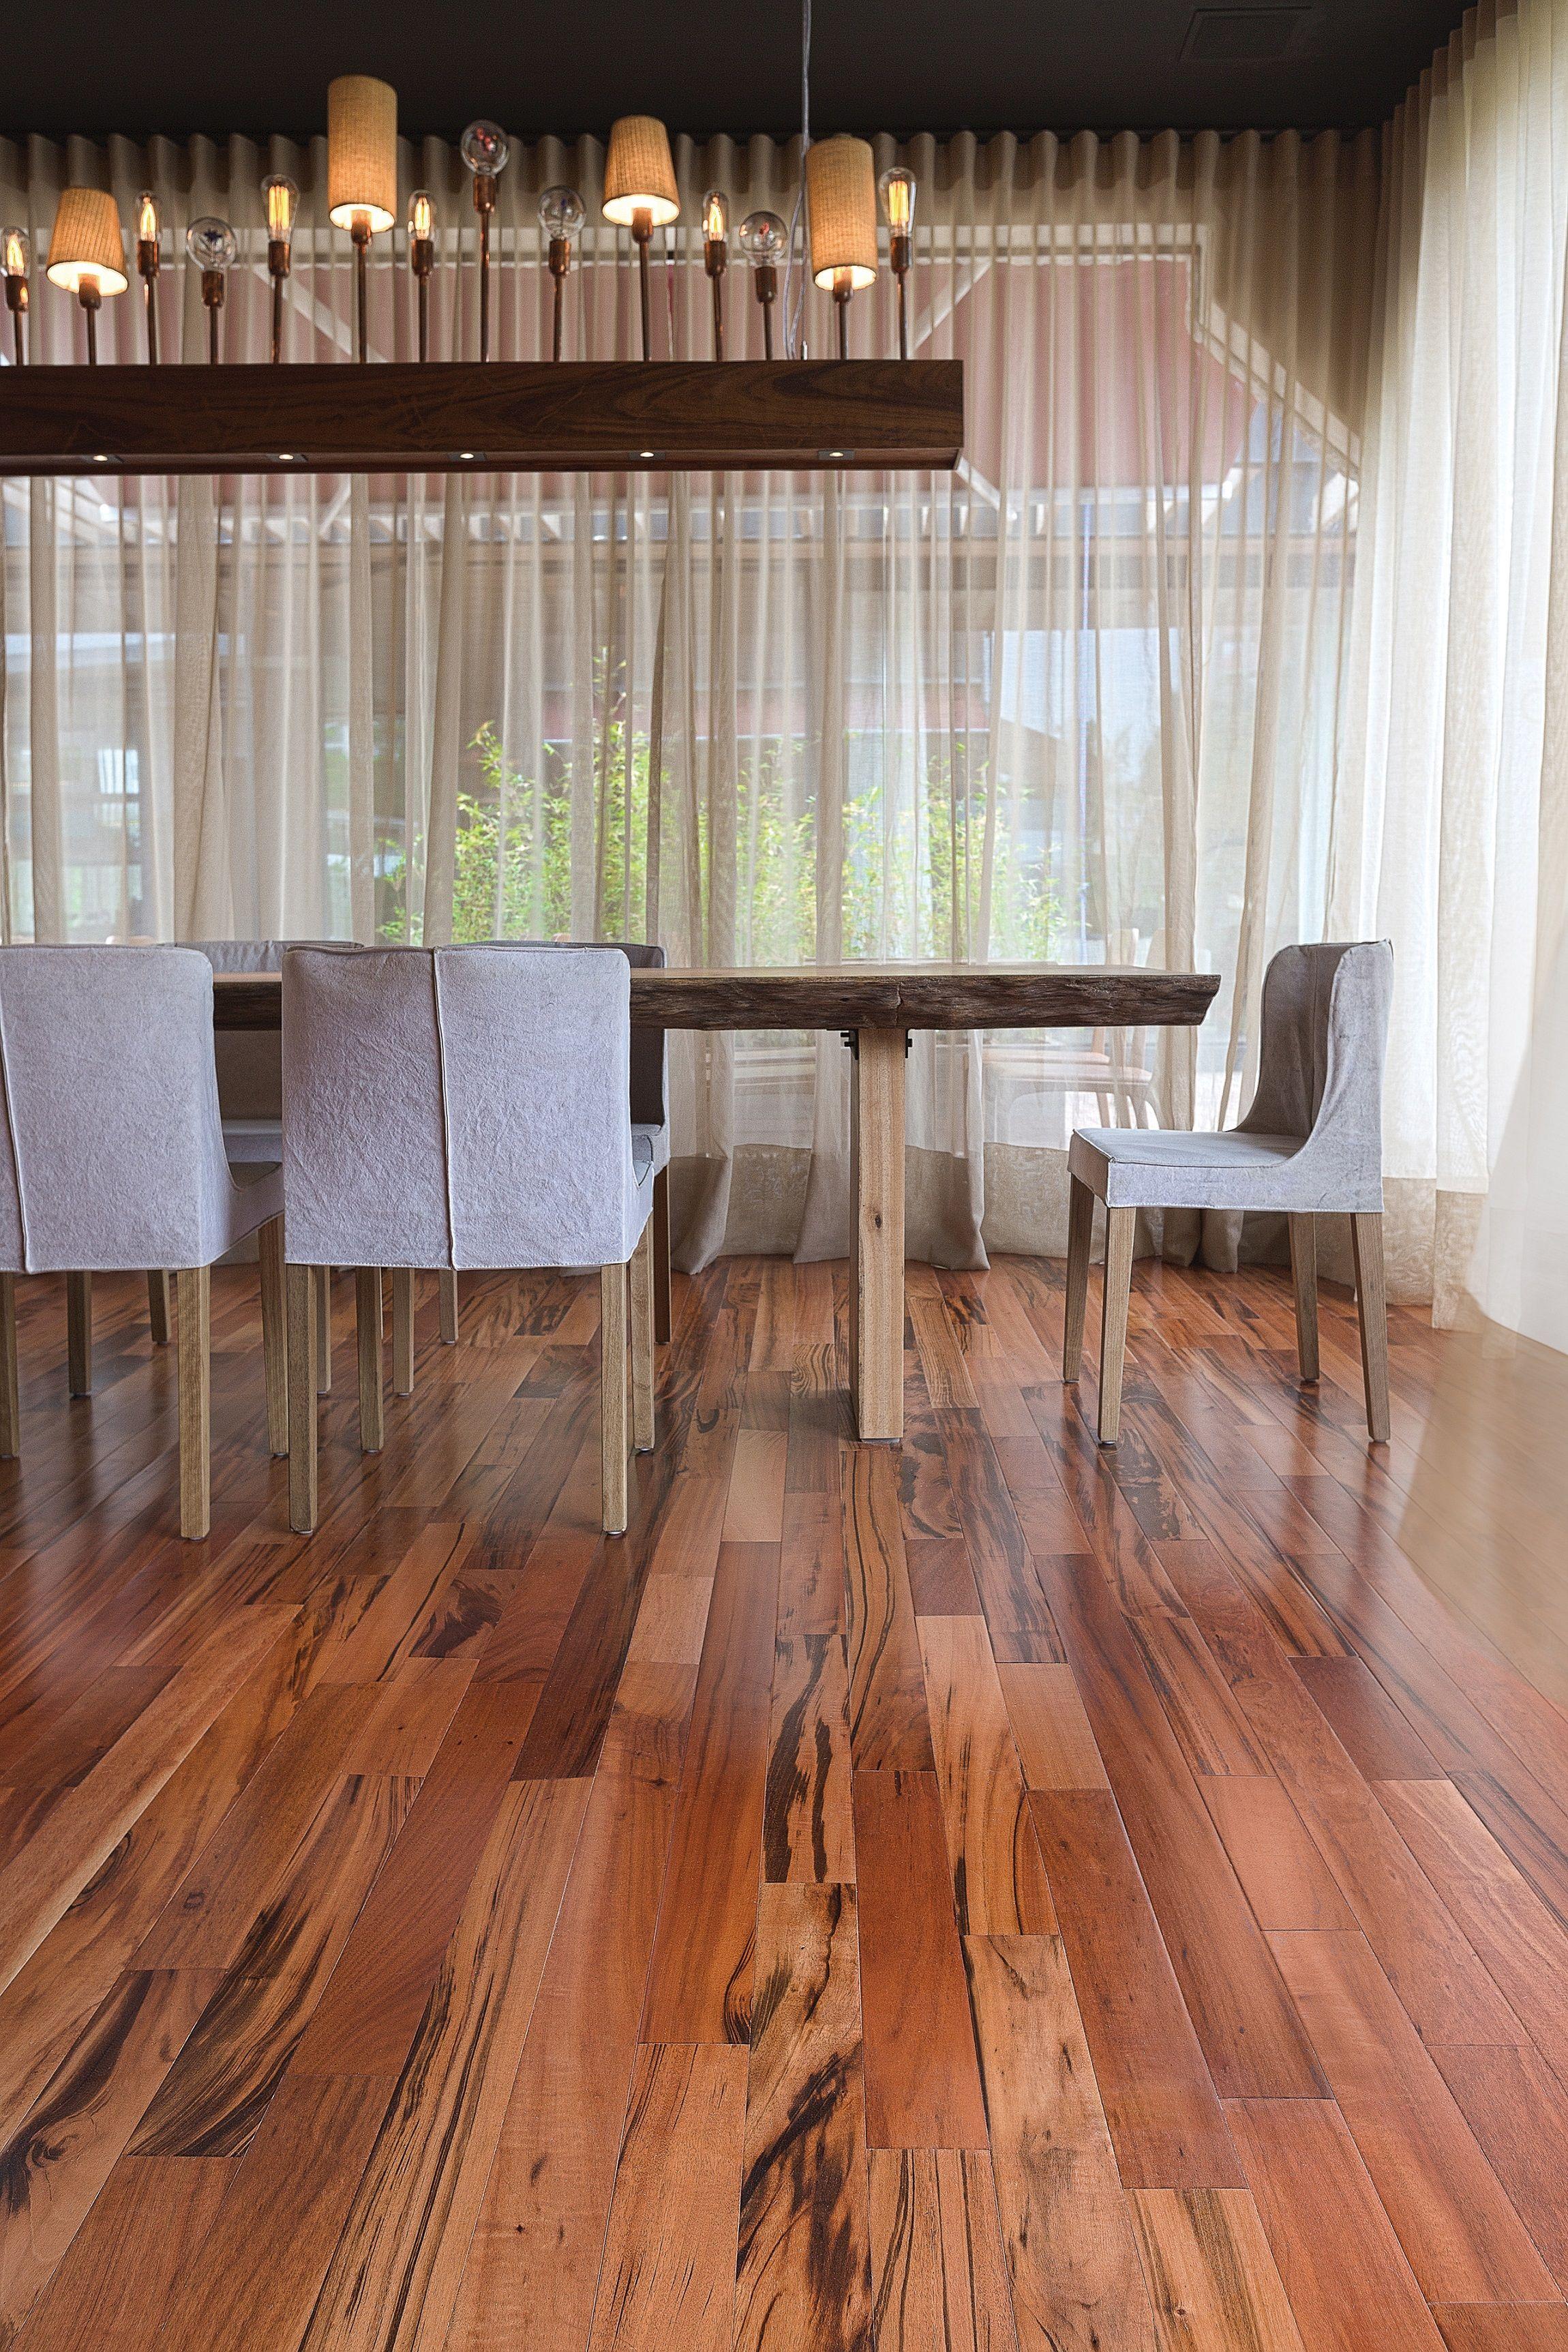 tigerdeck floor tigerwood flooring deck floors tiger natural close wood hardwood